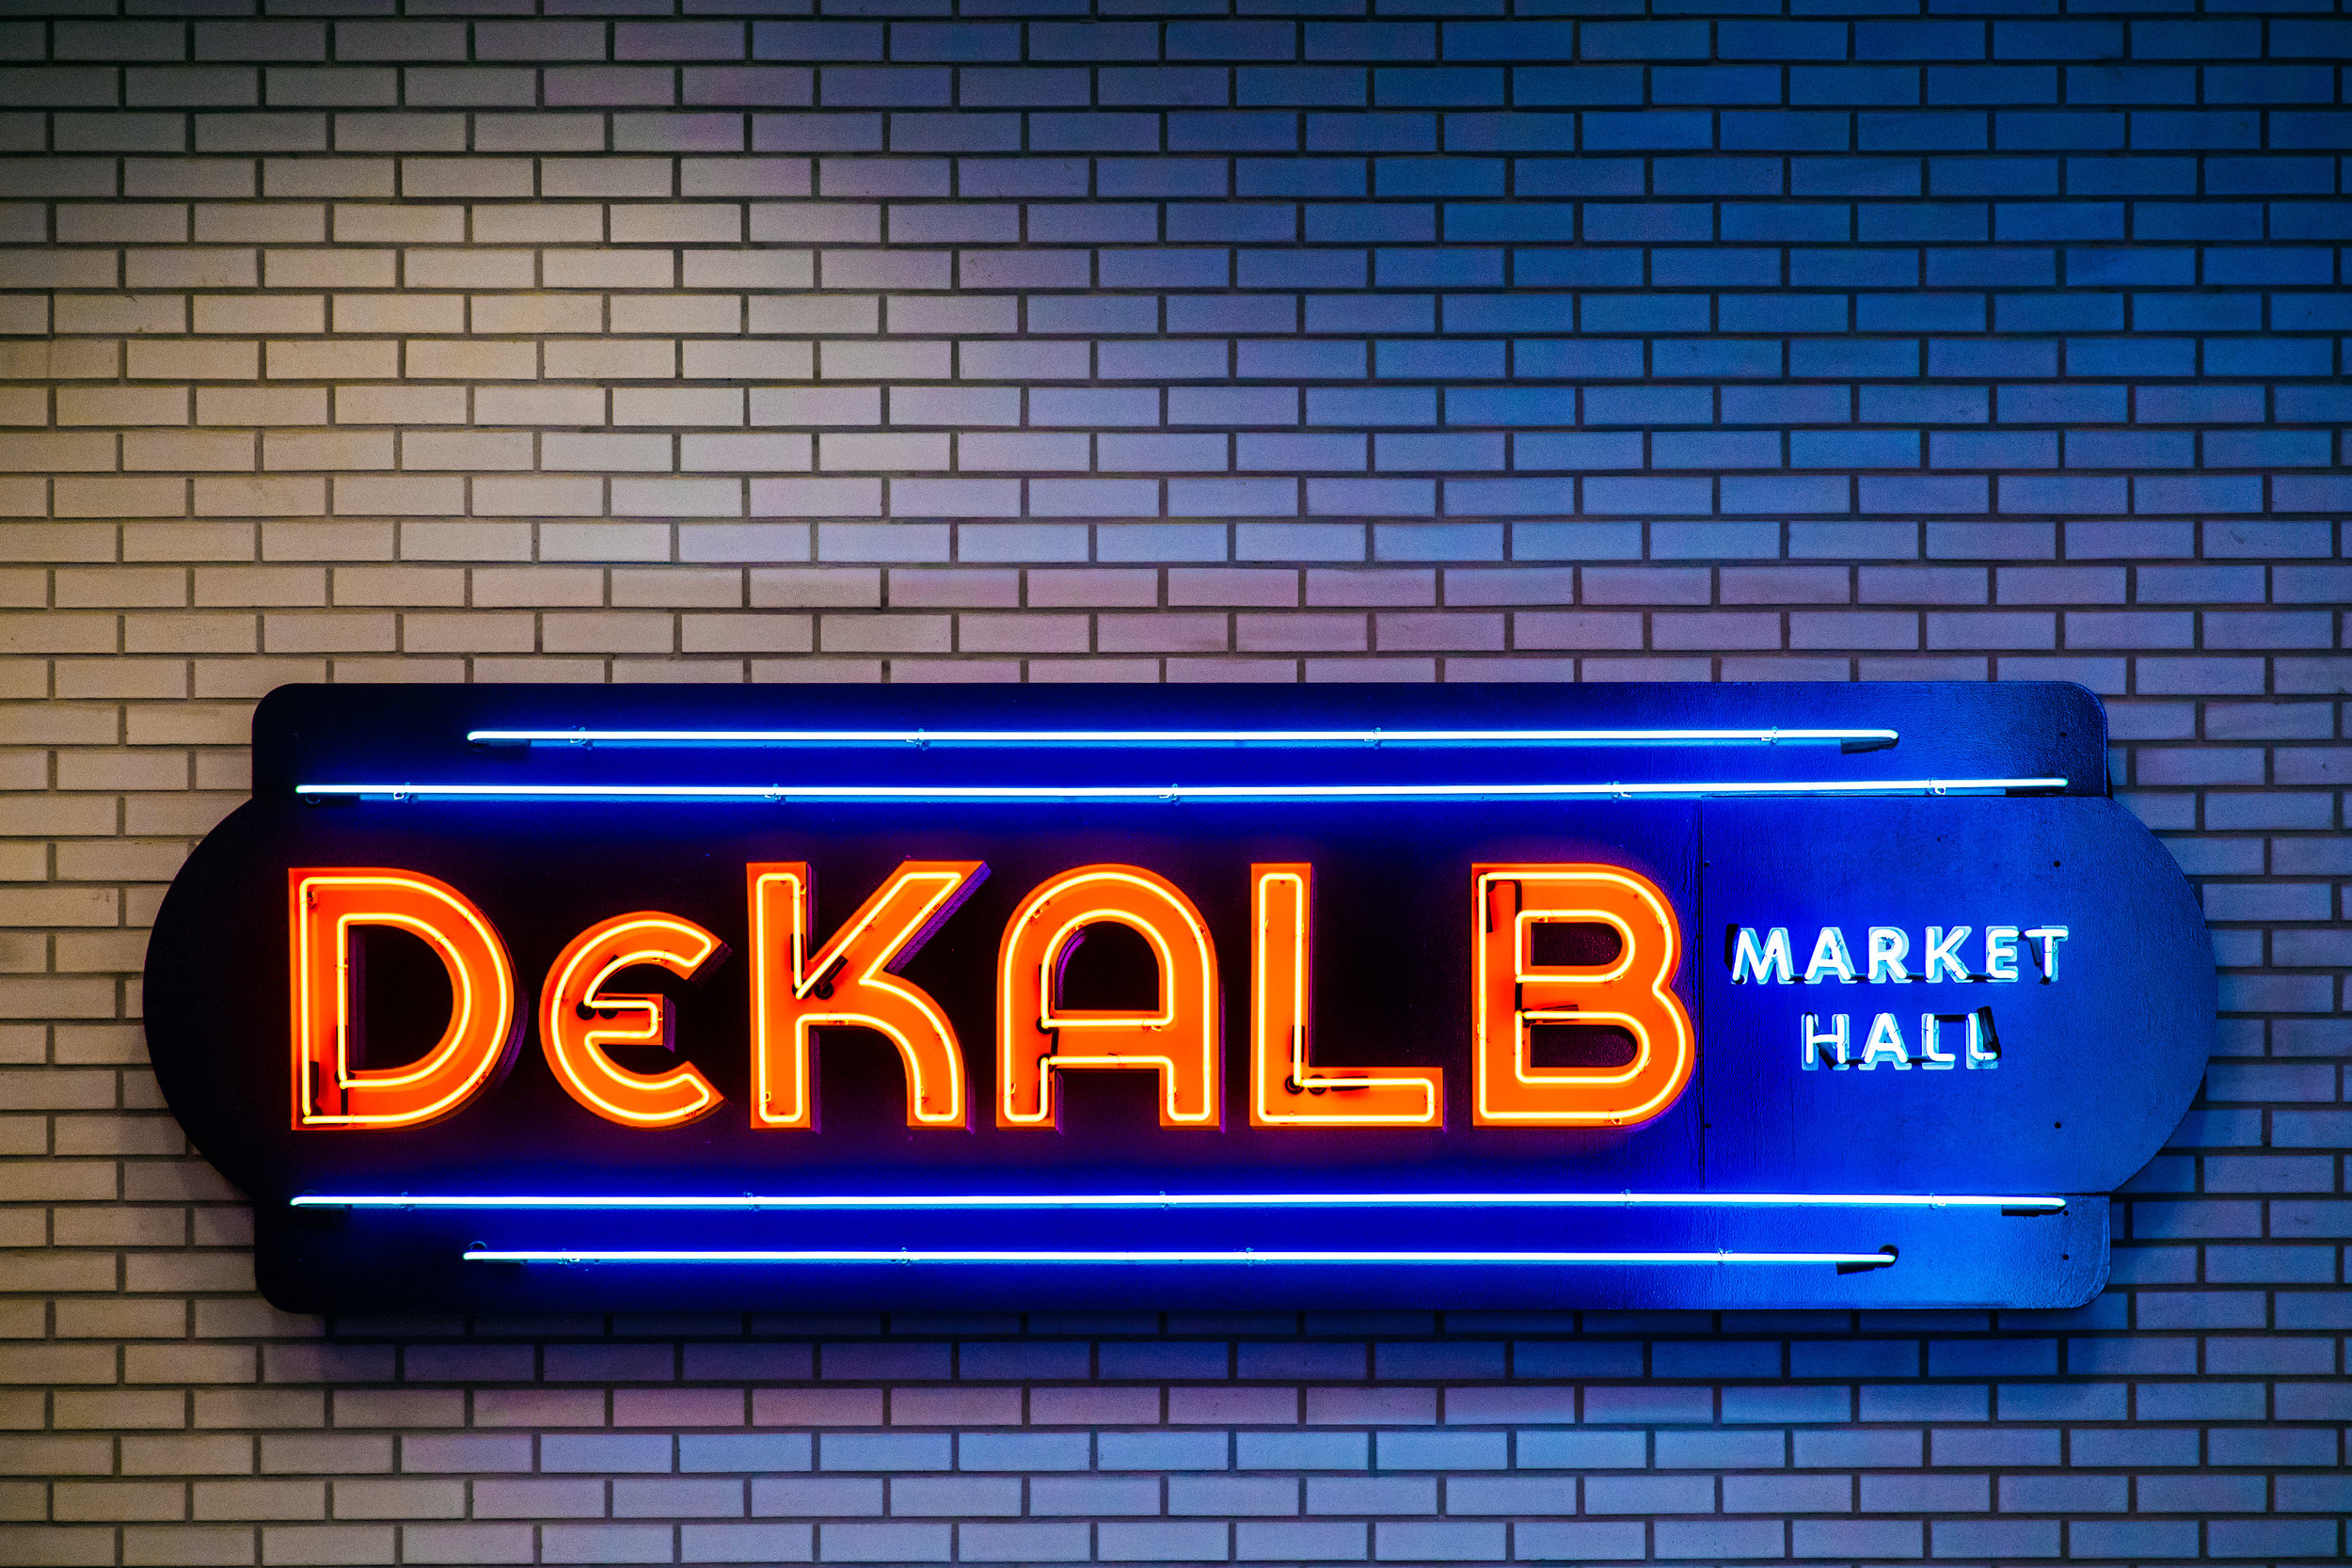 LSNY_Dekalb_Market_Hall-1.jpg